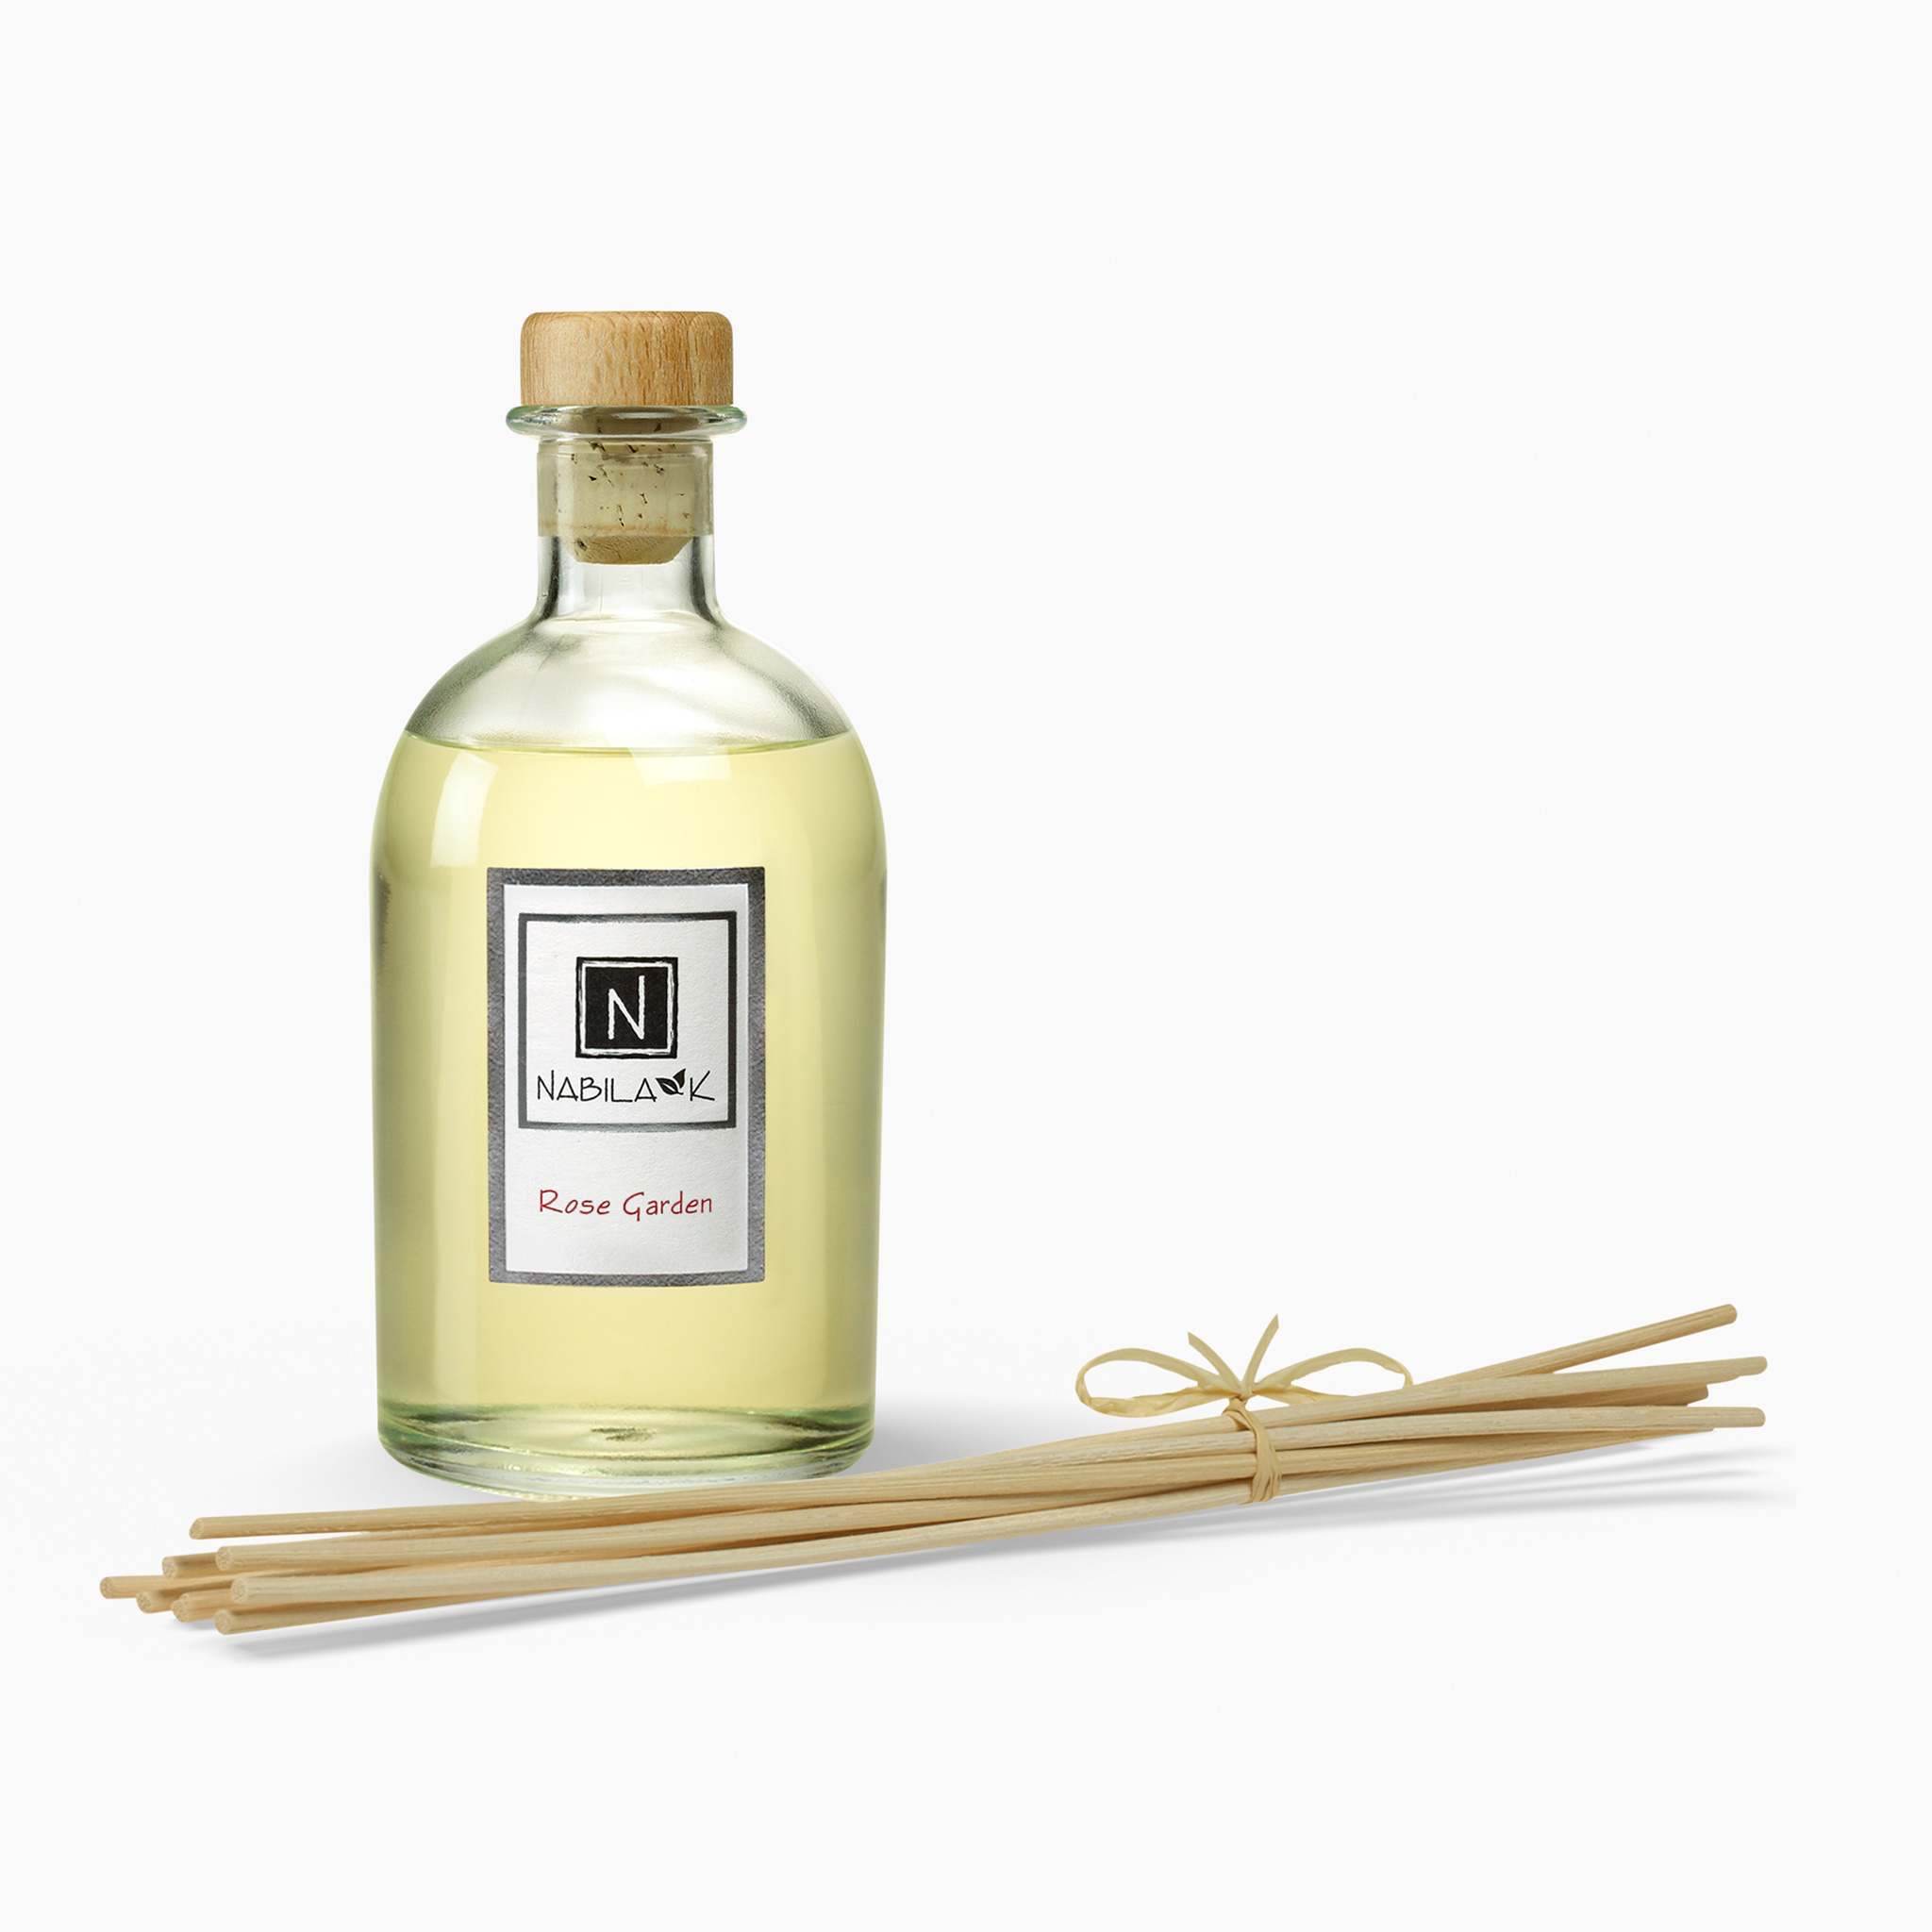 1 Bottle of Nabila K's Rose Garden Diffuser with Reeds